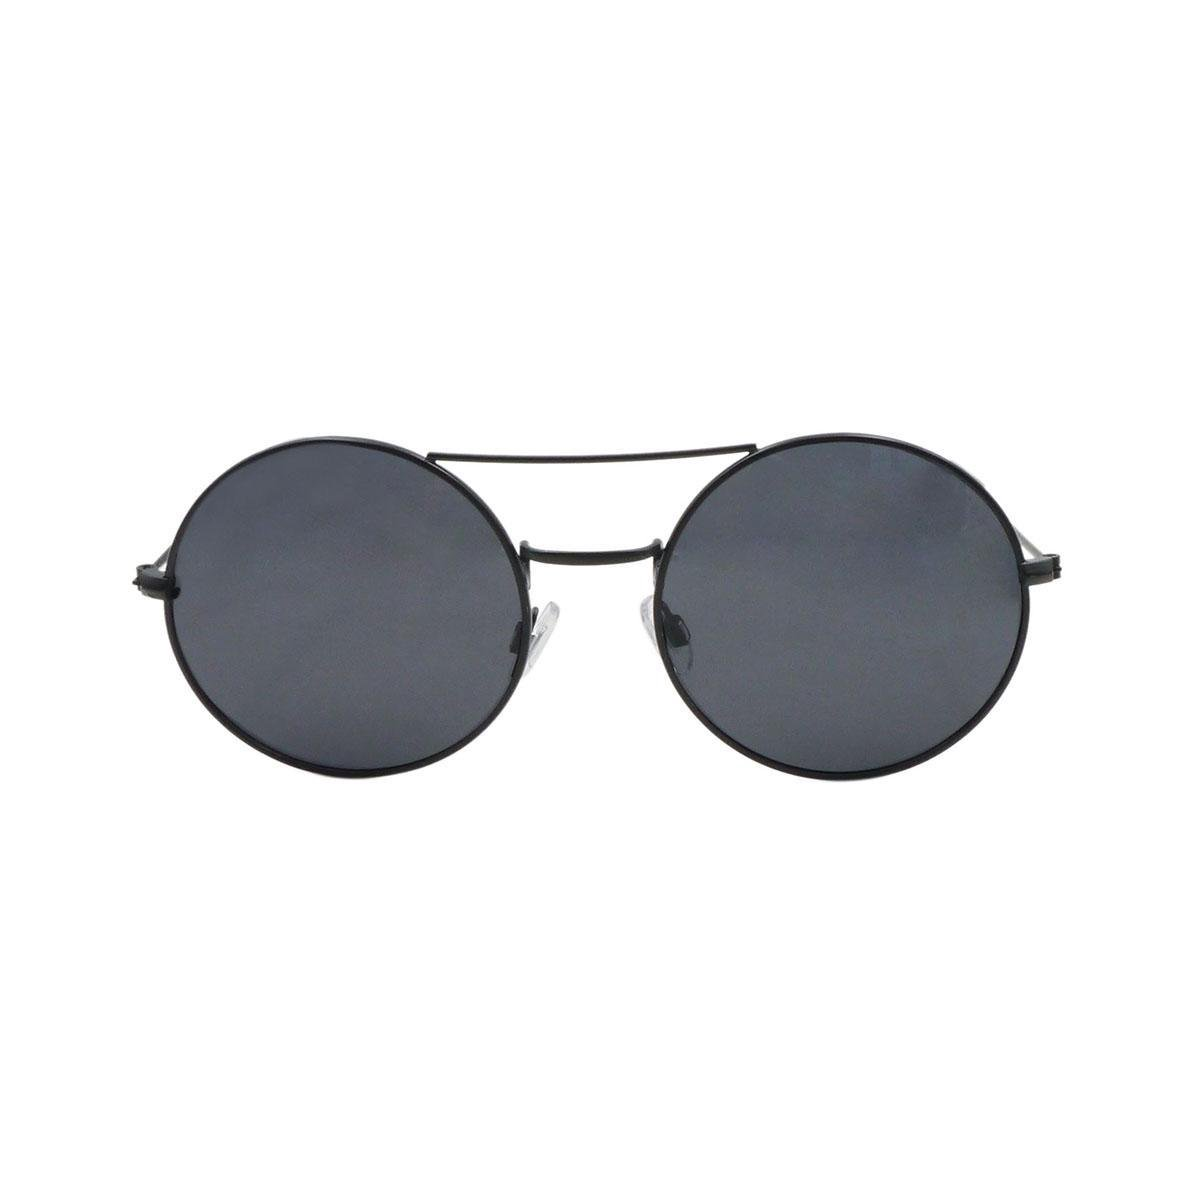 Ocean Sunglasses - Zonnebril - Unisex - 10-3_CIRCLE_MATTEBLACK-SMOKE - Ocean Sunglasses